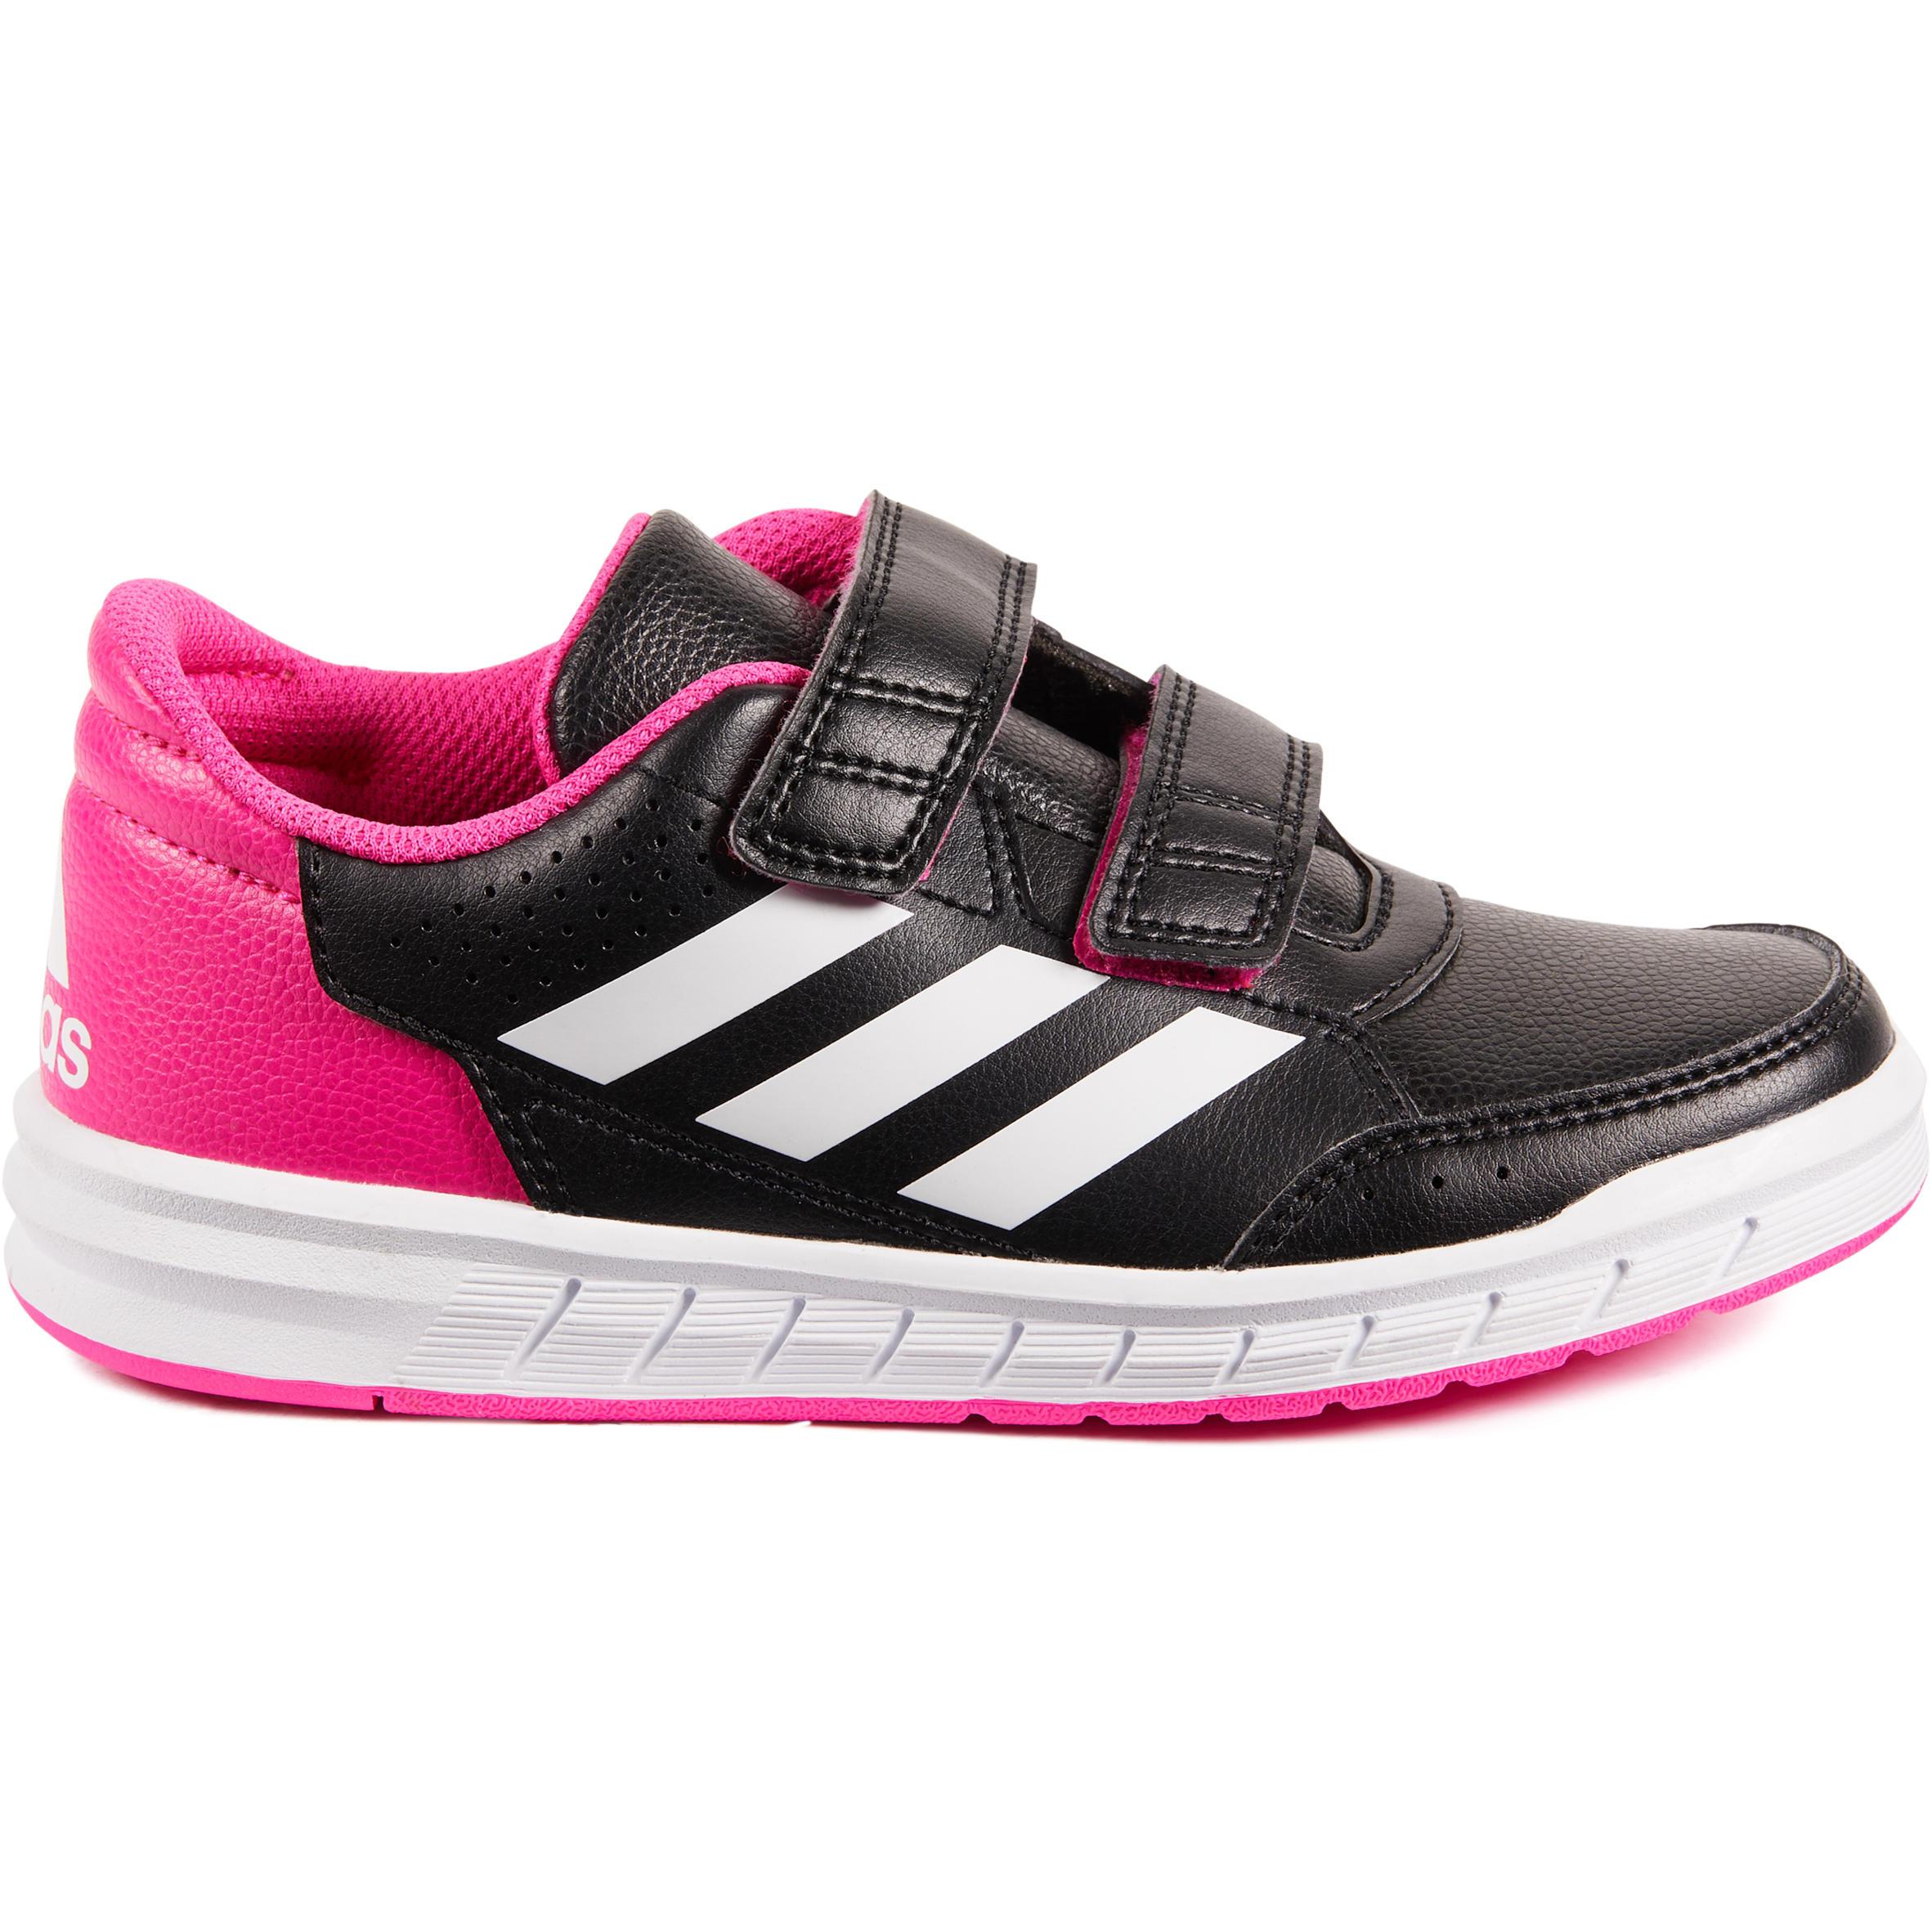 Adidas Tennisschoenen kinderen Adidas Altasport zwart/roze